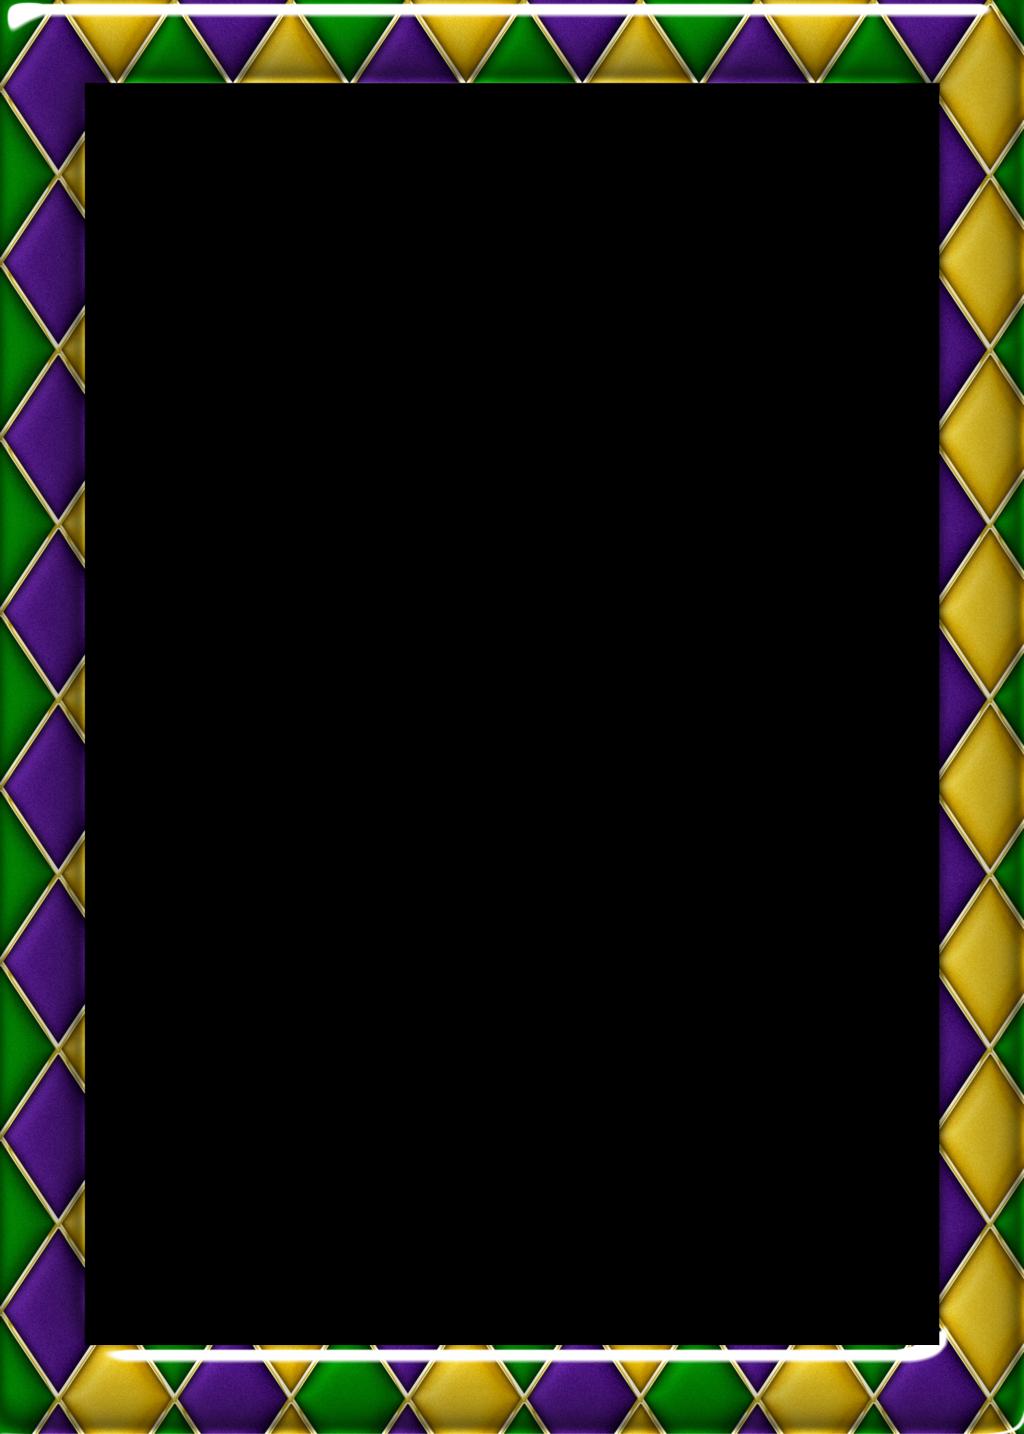 FREE 5x7 Harlequin Pattern 1 Mardi Gras Frame by RedHeadFalcon ...